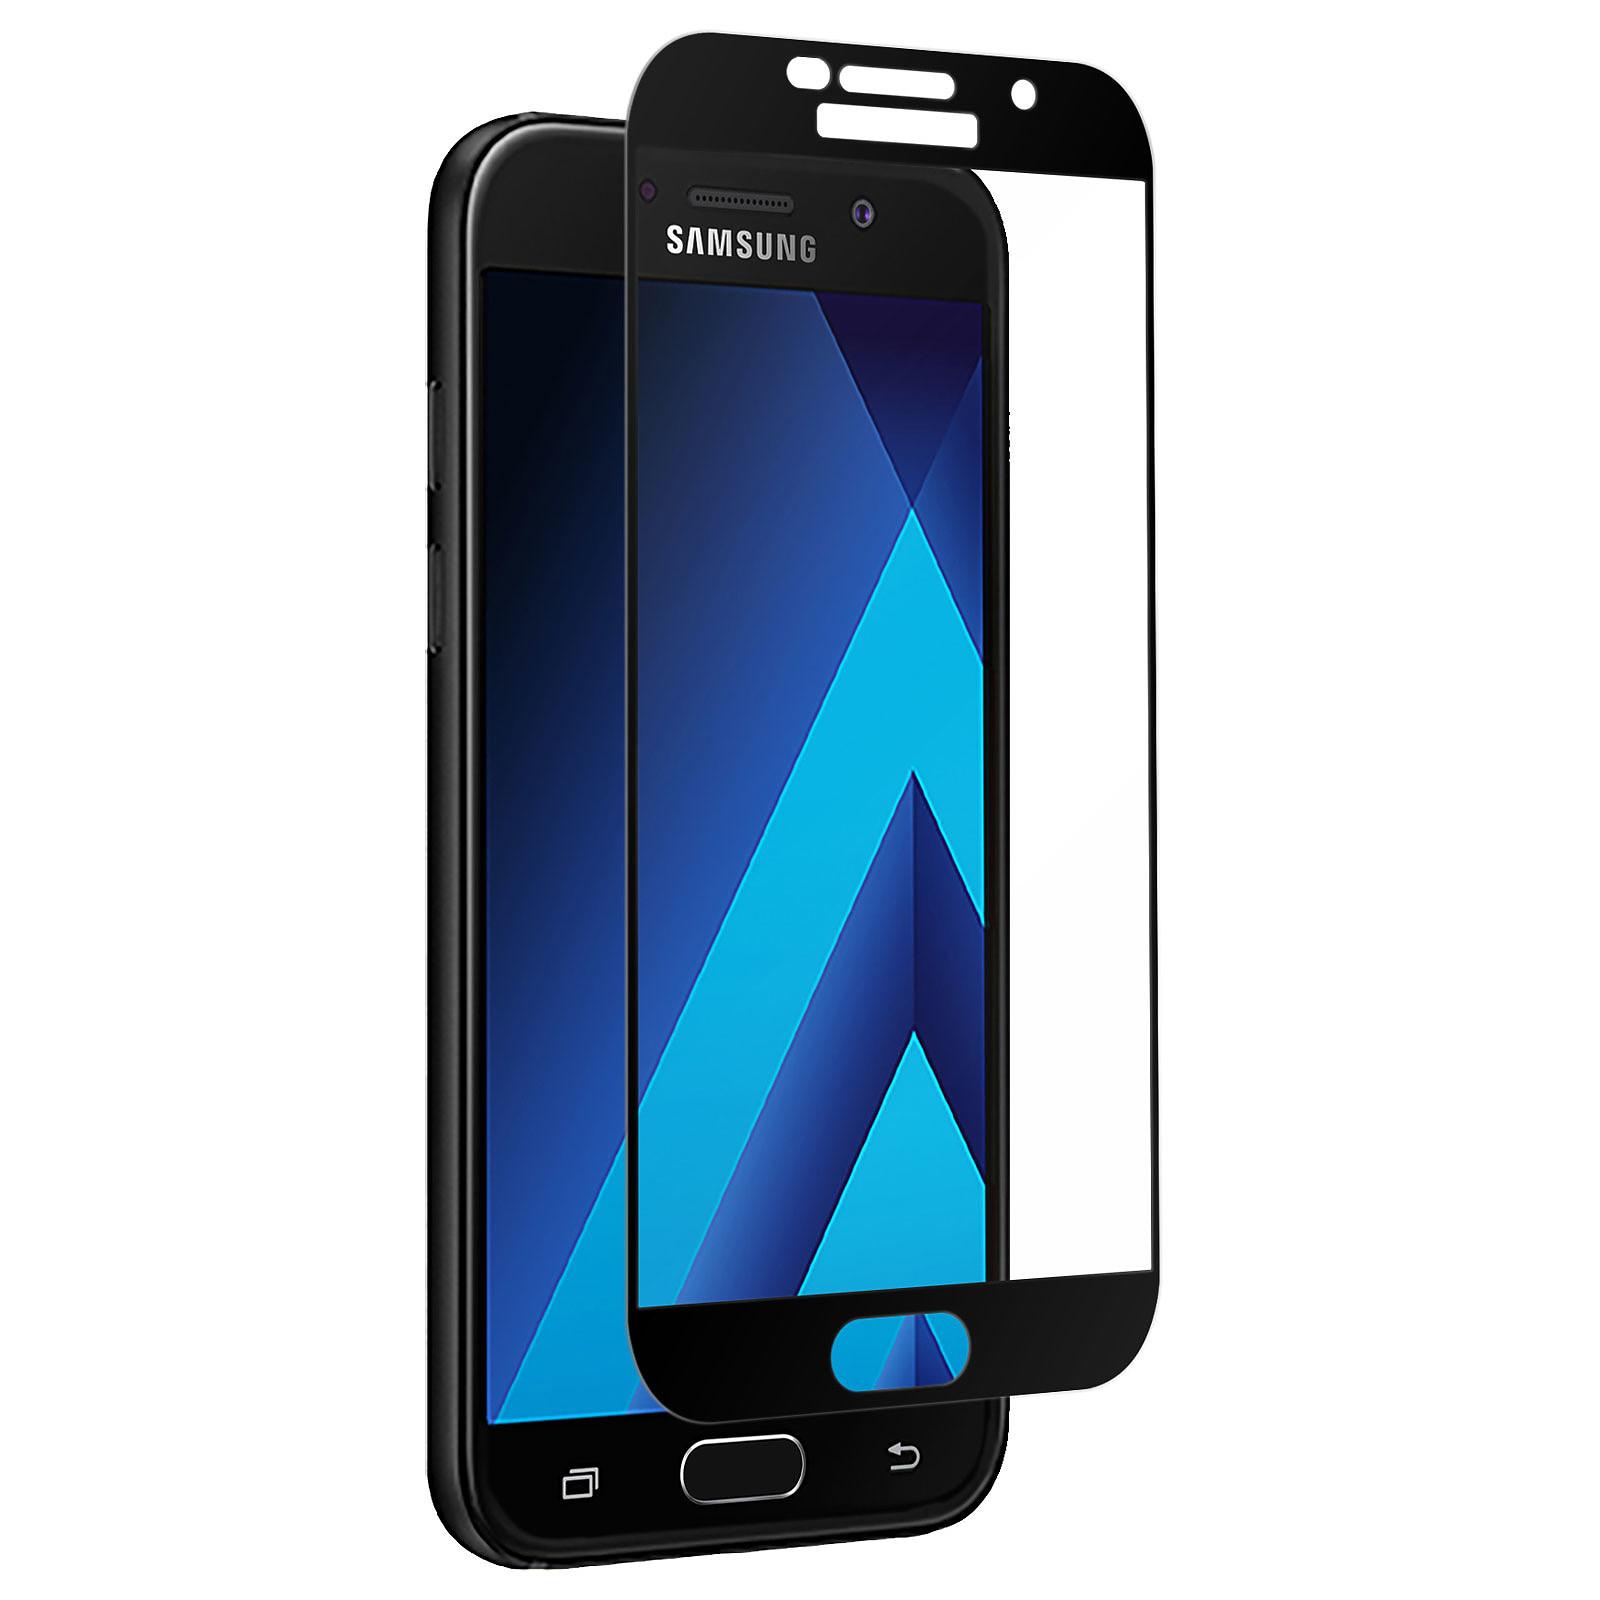 QDOS OptiGuard Glass Protect Galaxy A3 2017